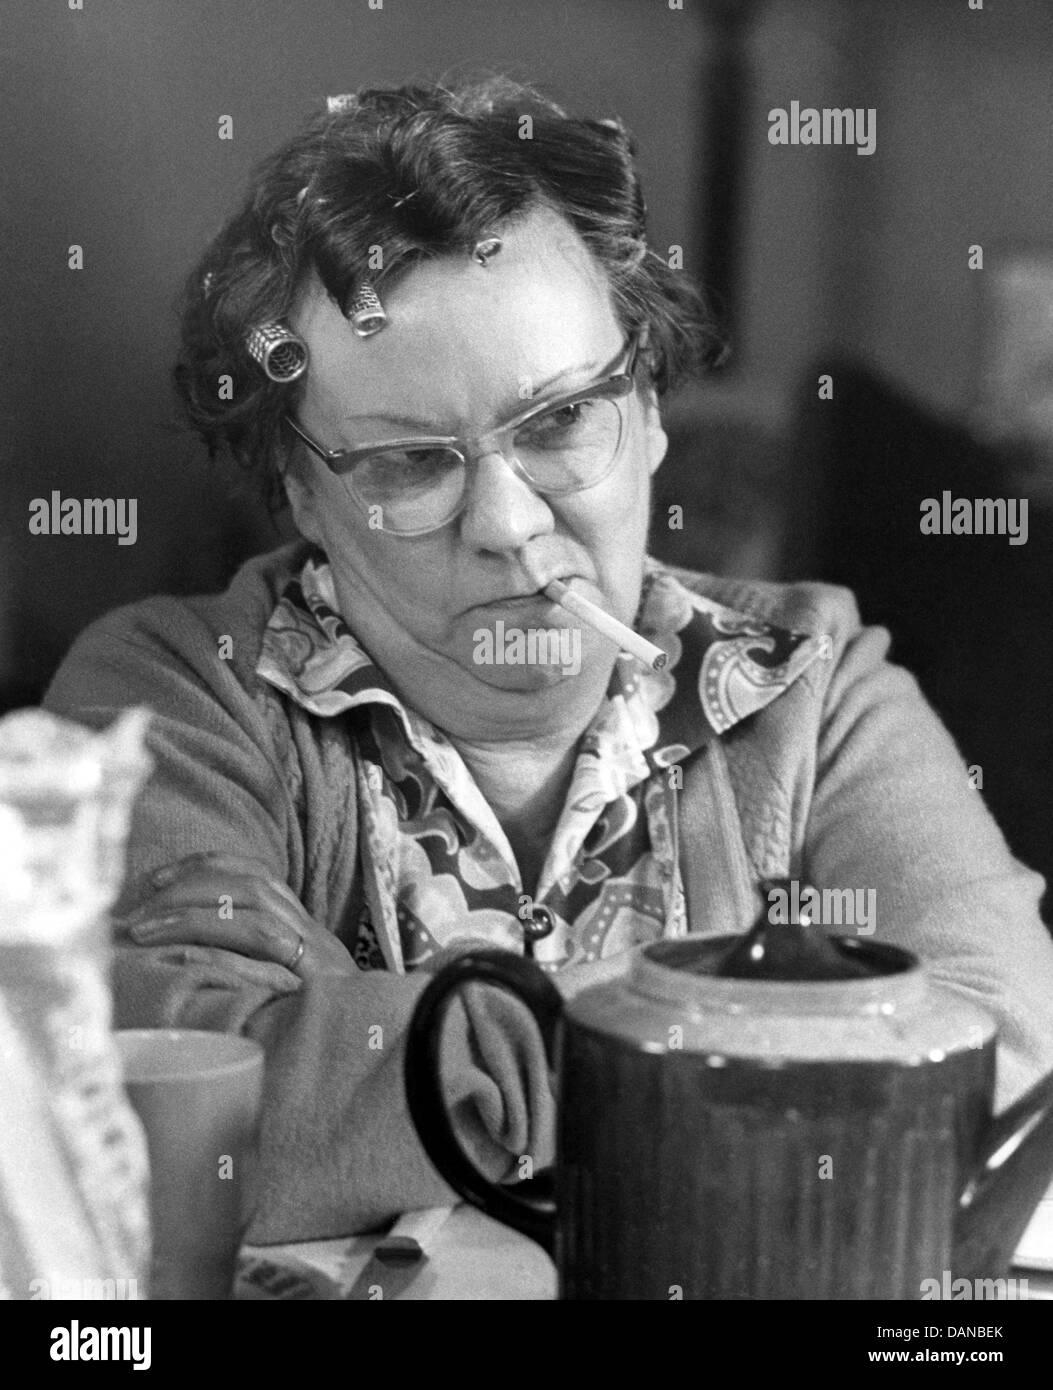 THE ALF GARNETT SAGA (1972) DANDY NICHOLLS, BOB KELLETT (DIR) TAGS 010 MOVIESTORE COLLECTION LTD - Stock Image